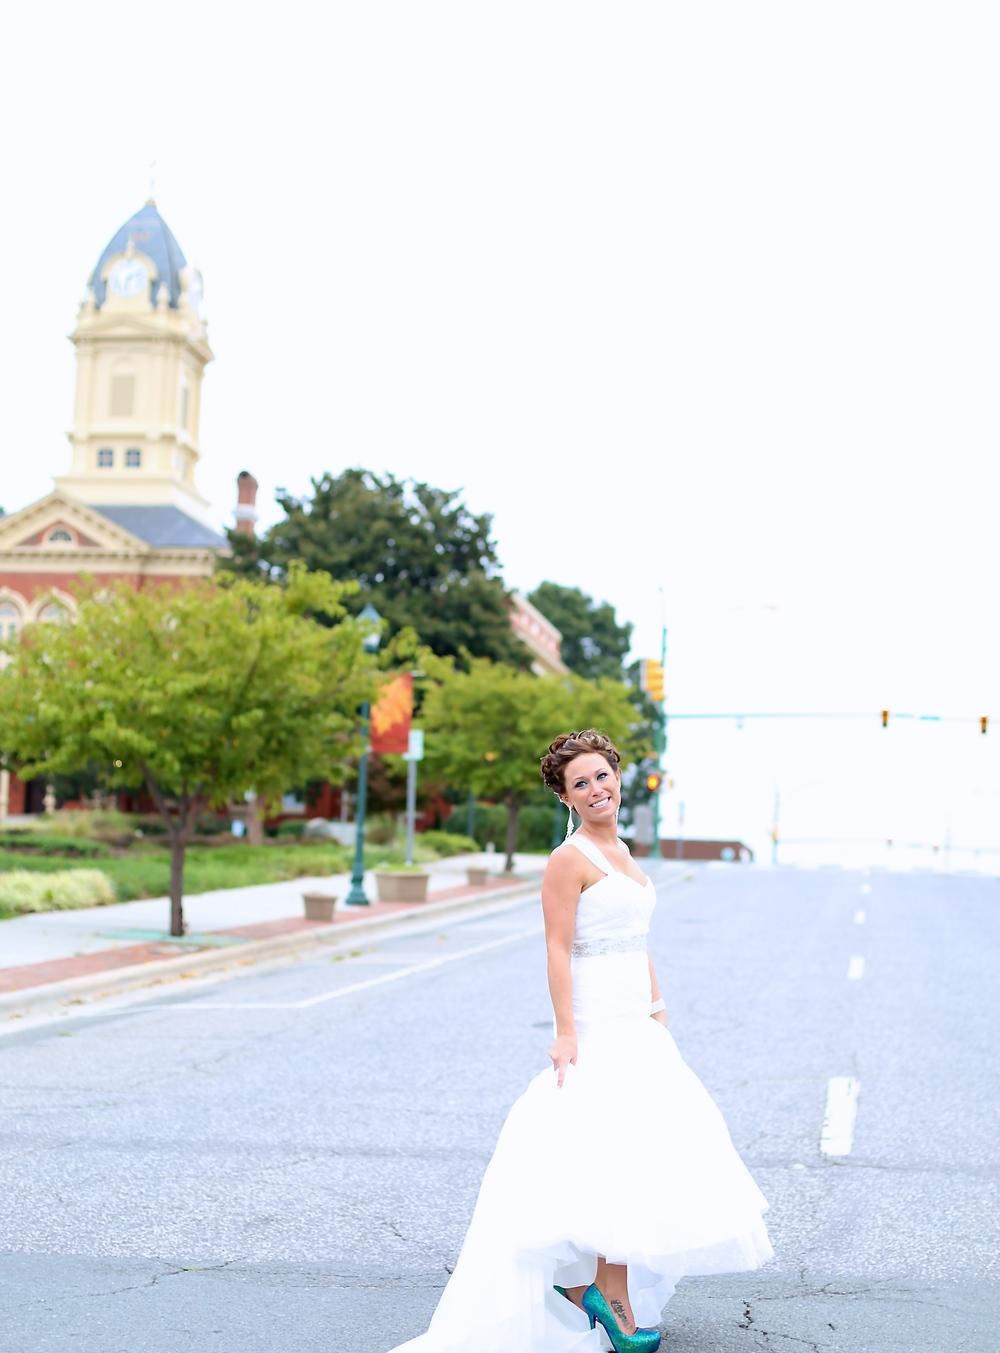 Joanna bridal shoot 16